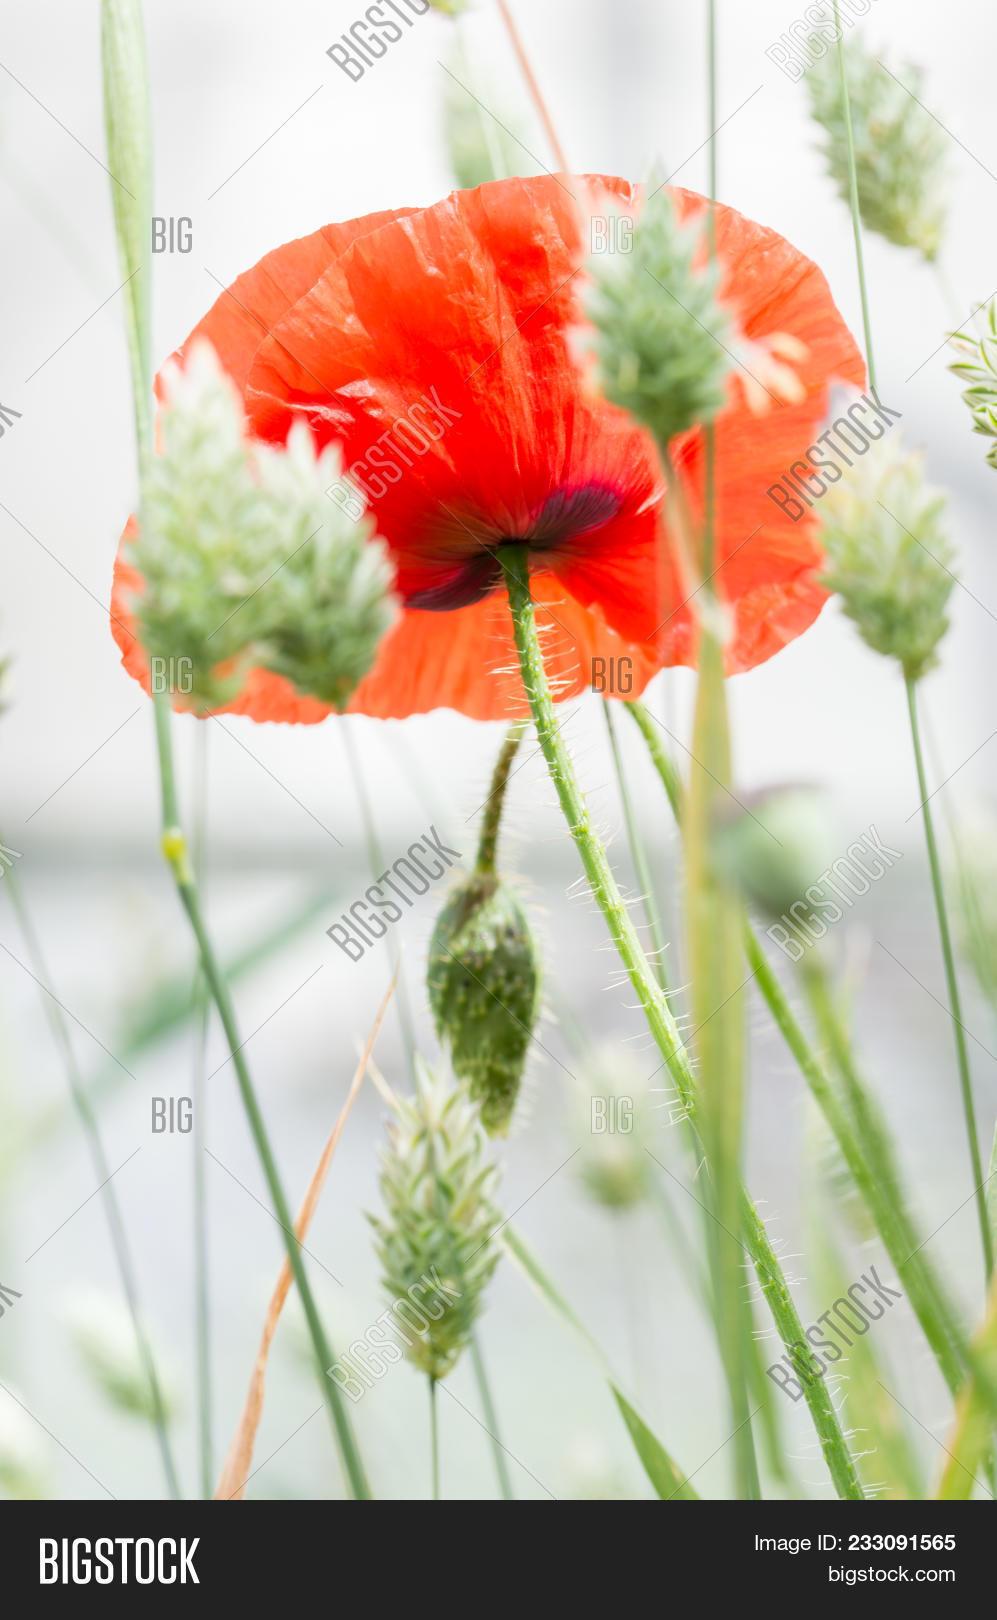 Flanders Poppy Flower Image Photo Free Trial Bigstock